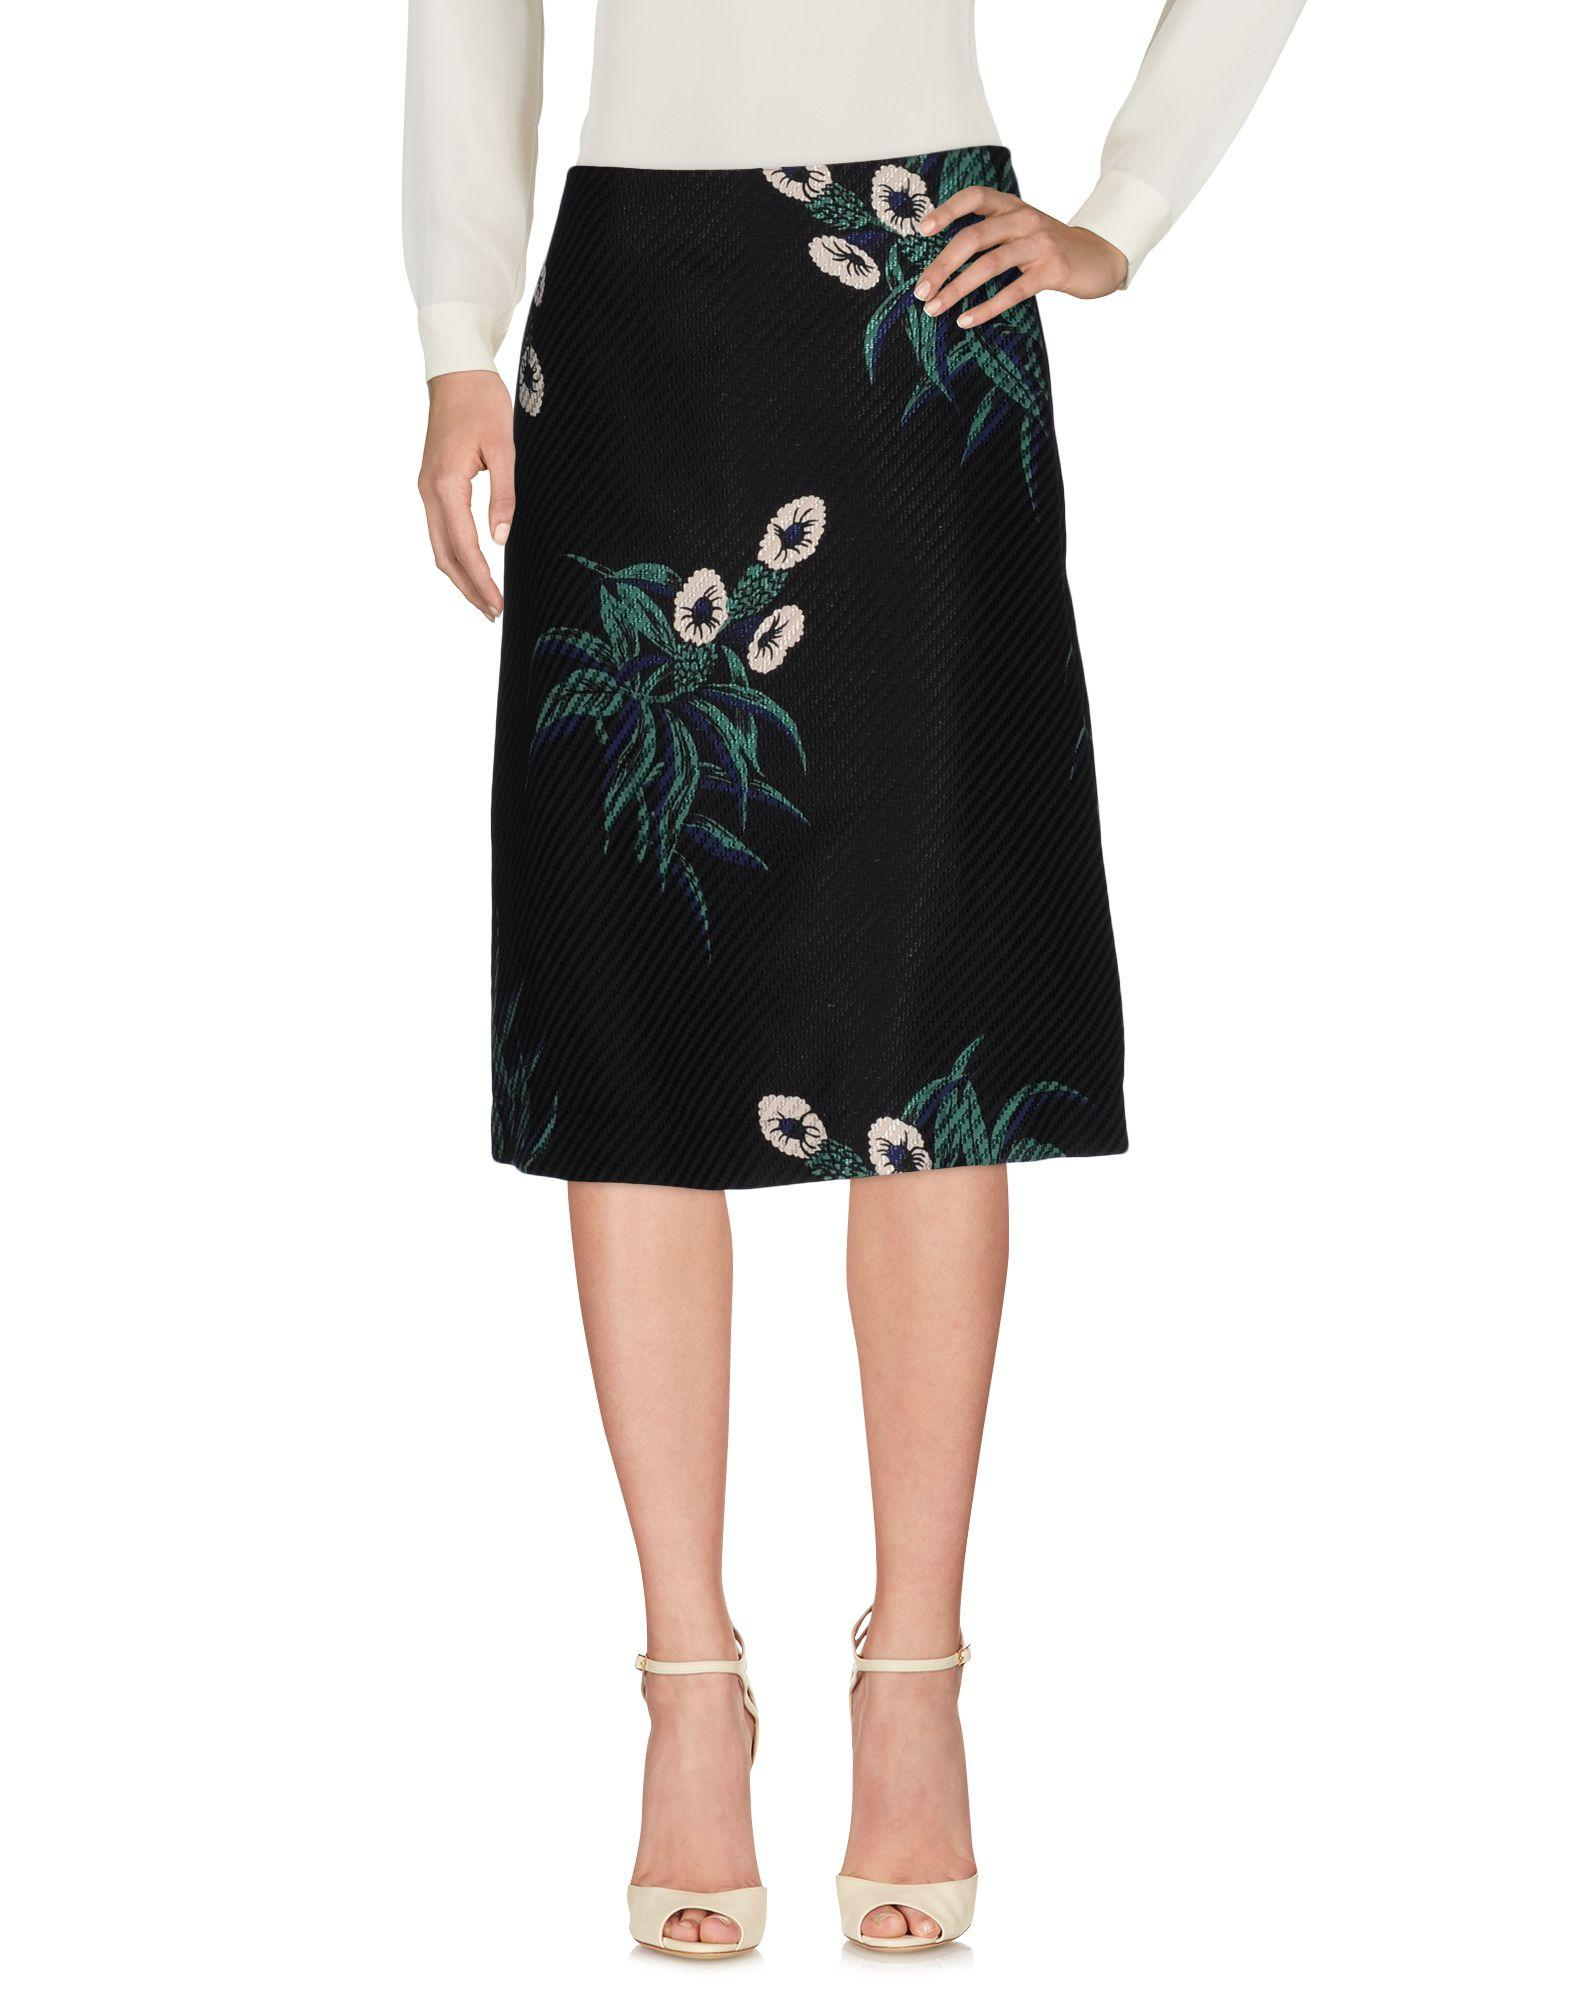 River Island Black Floral Printed Skirt